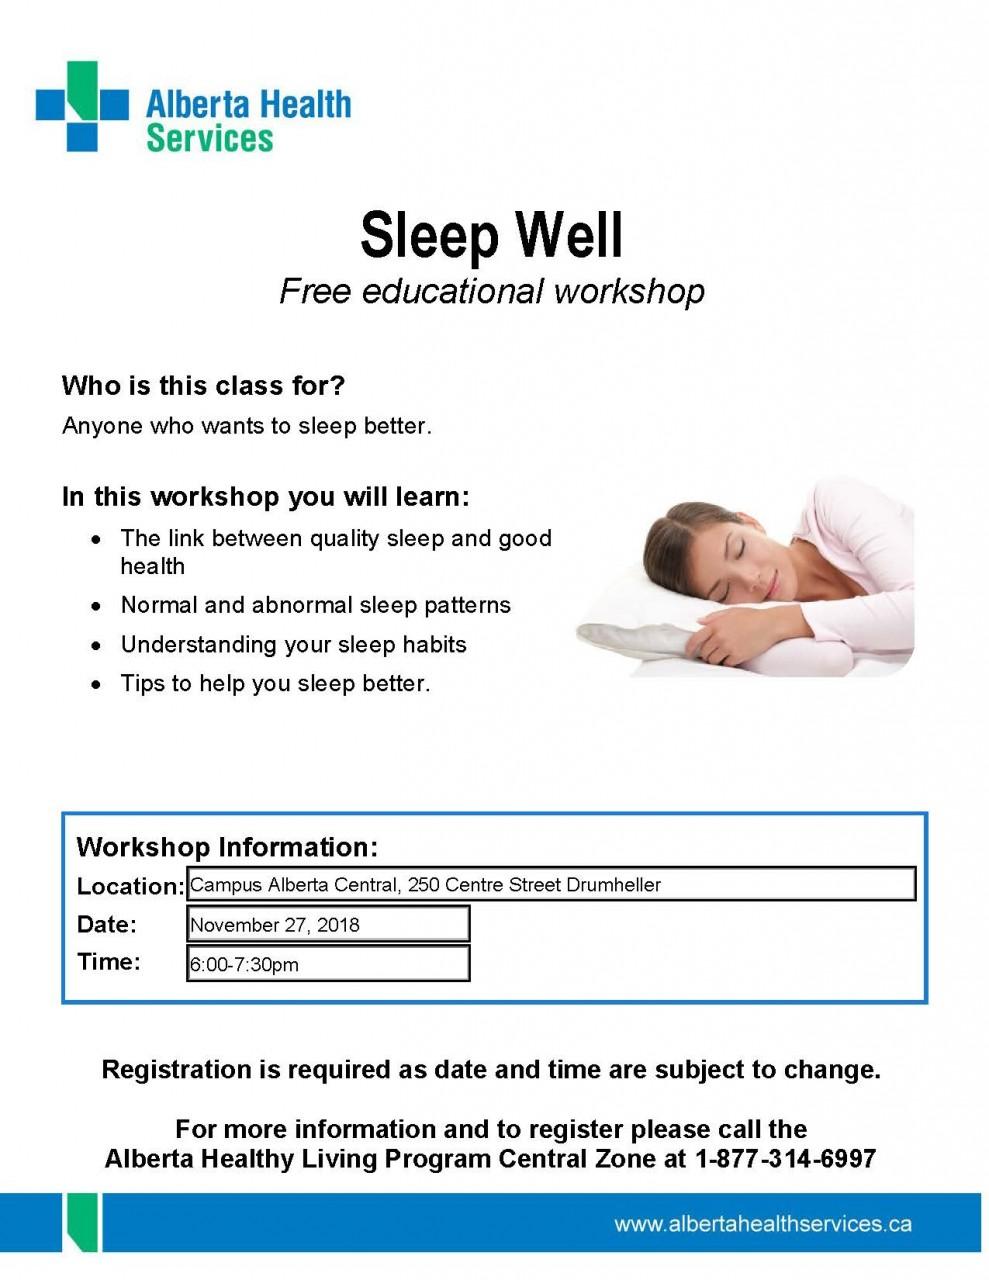 Drum-Campus-Alberta-HealthyLifestyles-Sleep-Well---Nov-27-2018